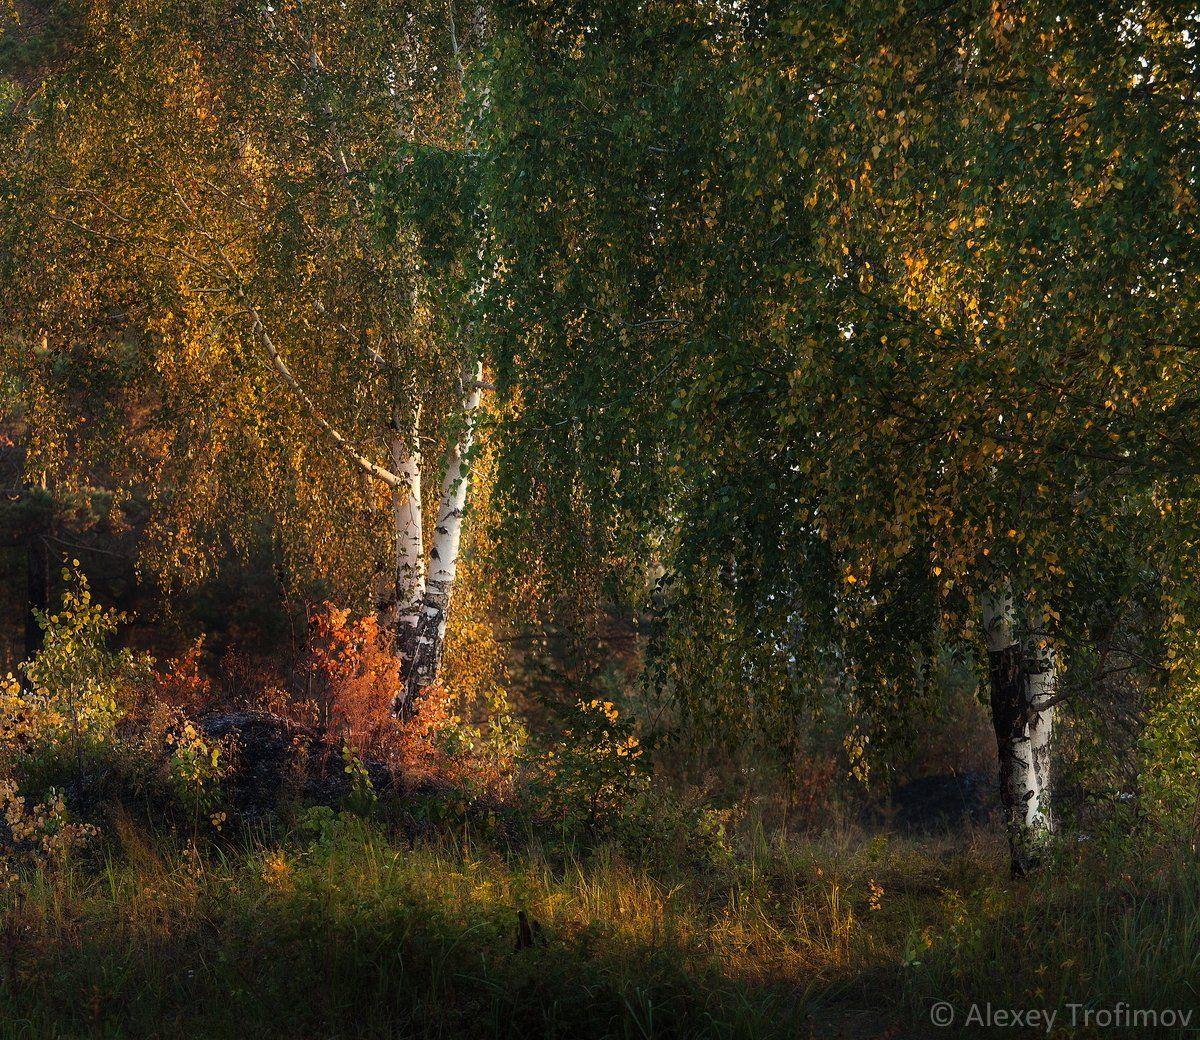 Ангара, Осень пейзаж, Сибирь, Алексей Трофимов